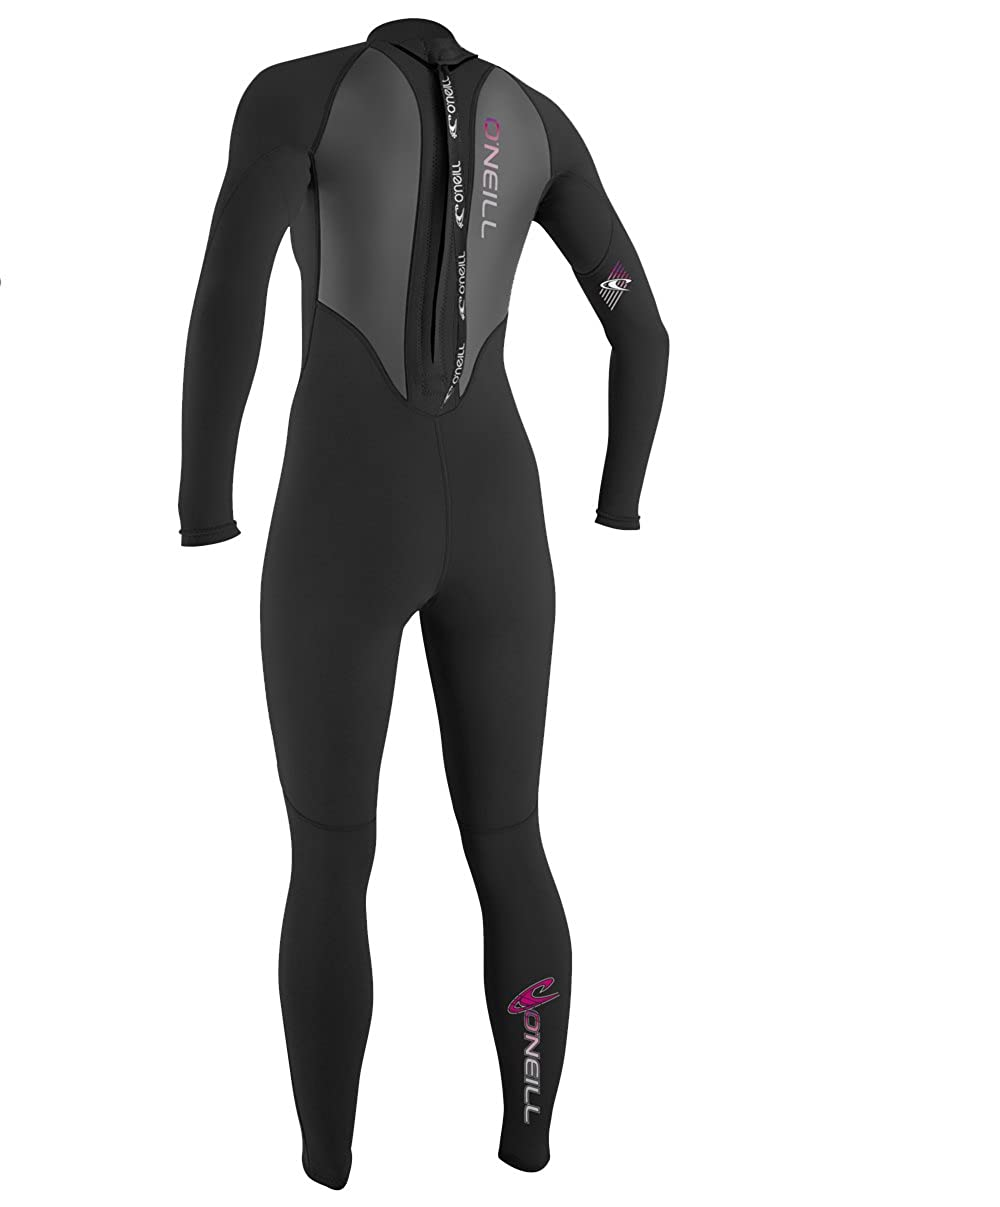 O Neill Women S Reactor 3 2mm Back Zip Full Wetsuit